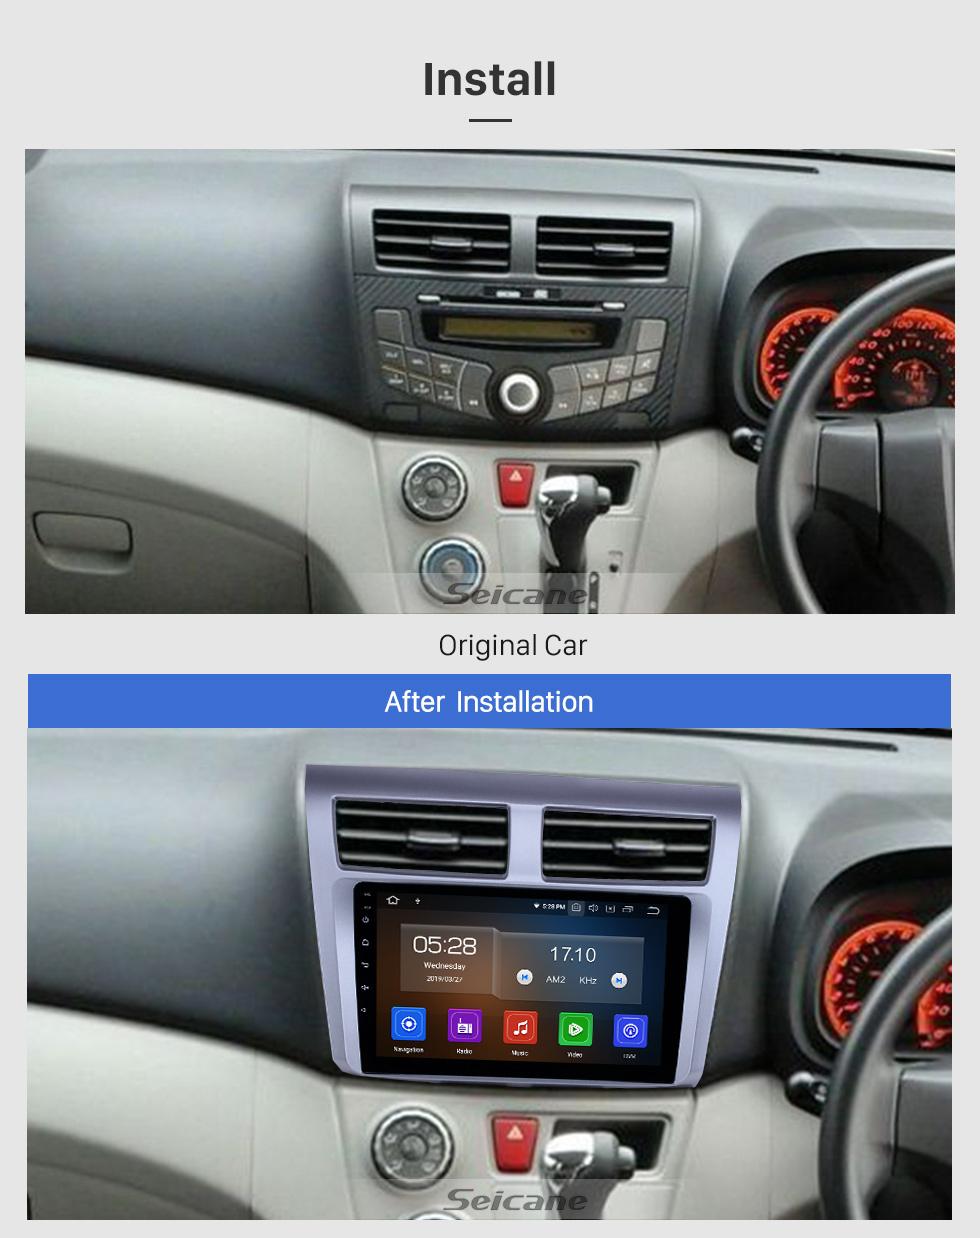 Seicane 9 inch Android 10.0 Radio for 2012-2014 Proton Myvi Bluetooth WIFI USB HD Touchscreen GPS Navigation Carplay support OBD2 DAB+ DVR